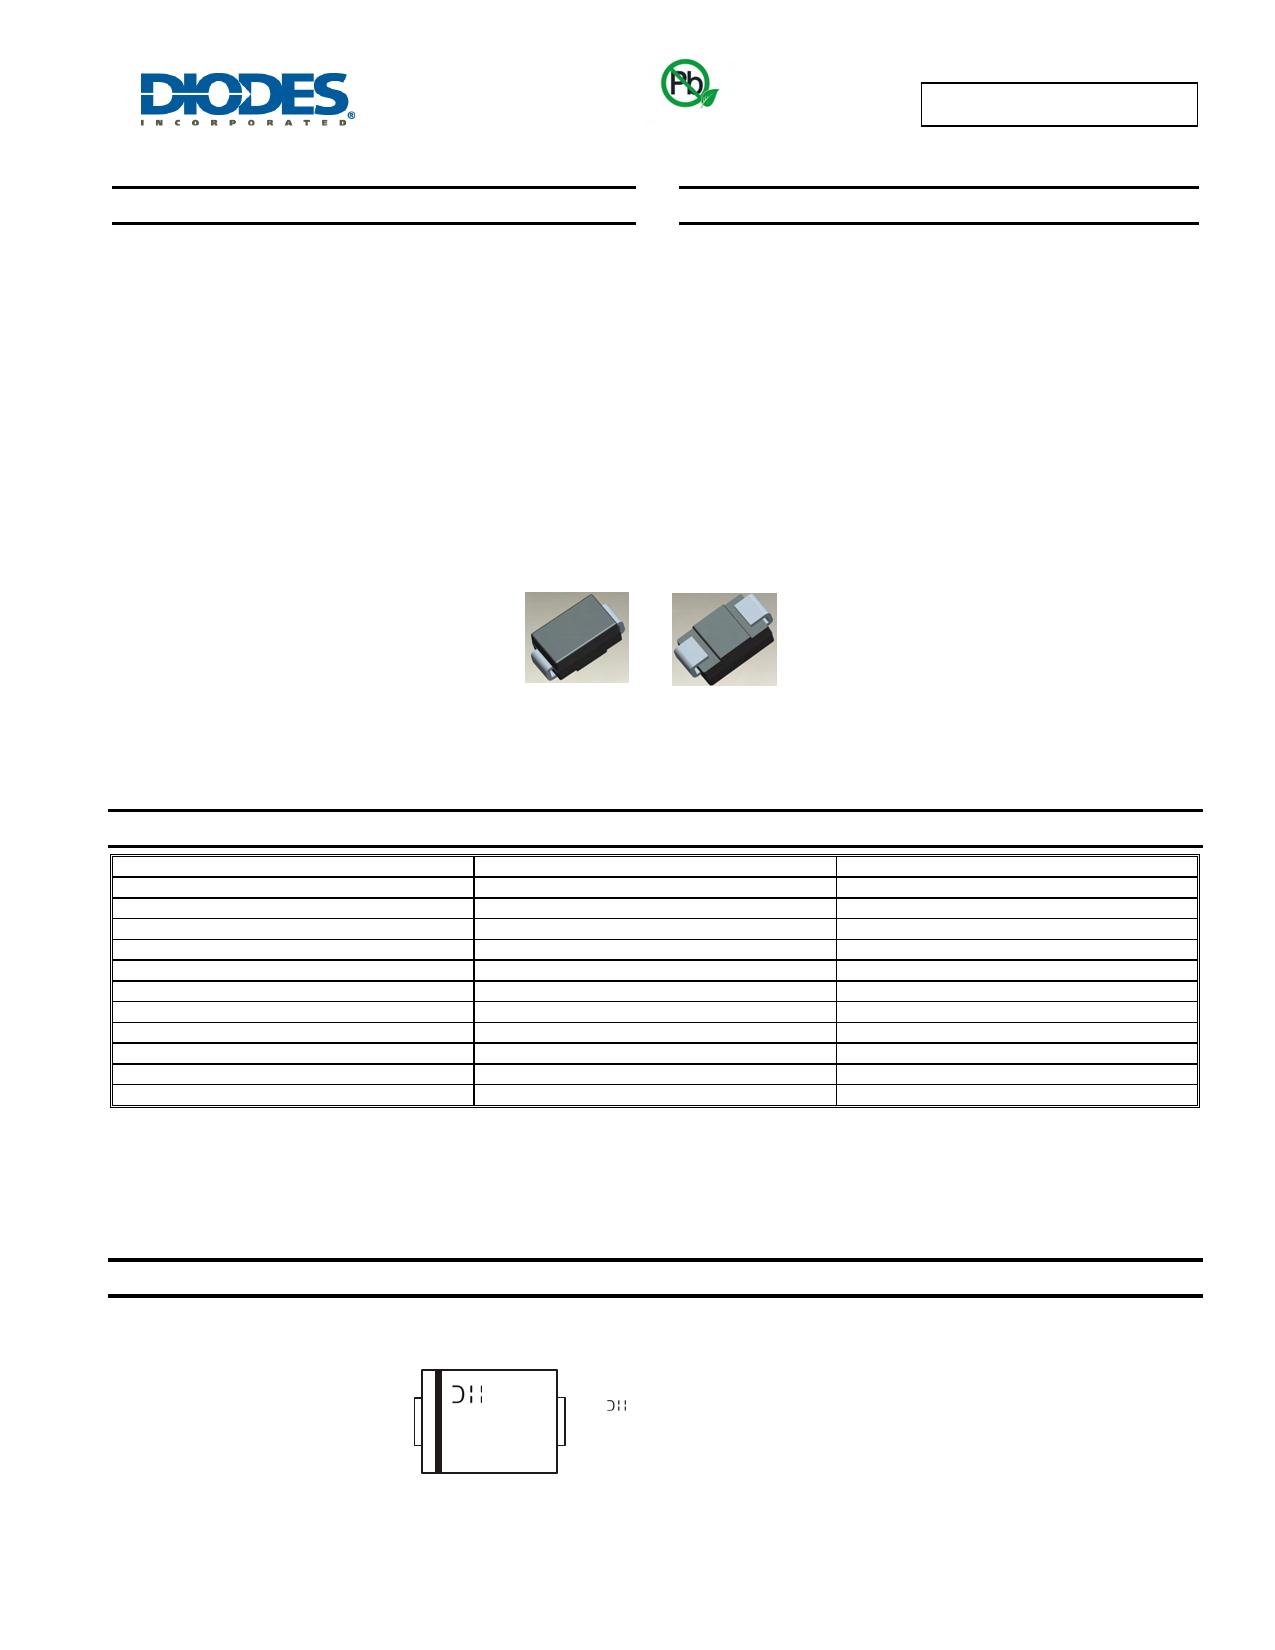 TB0640M datasheet